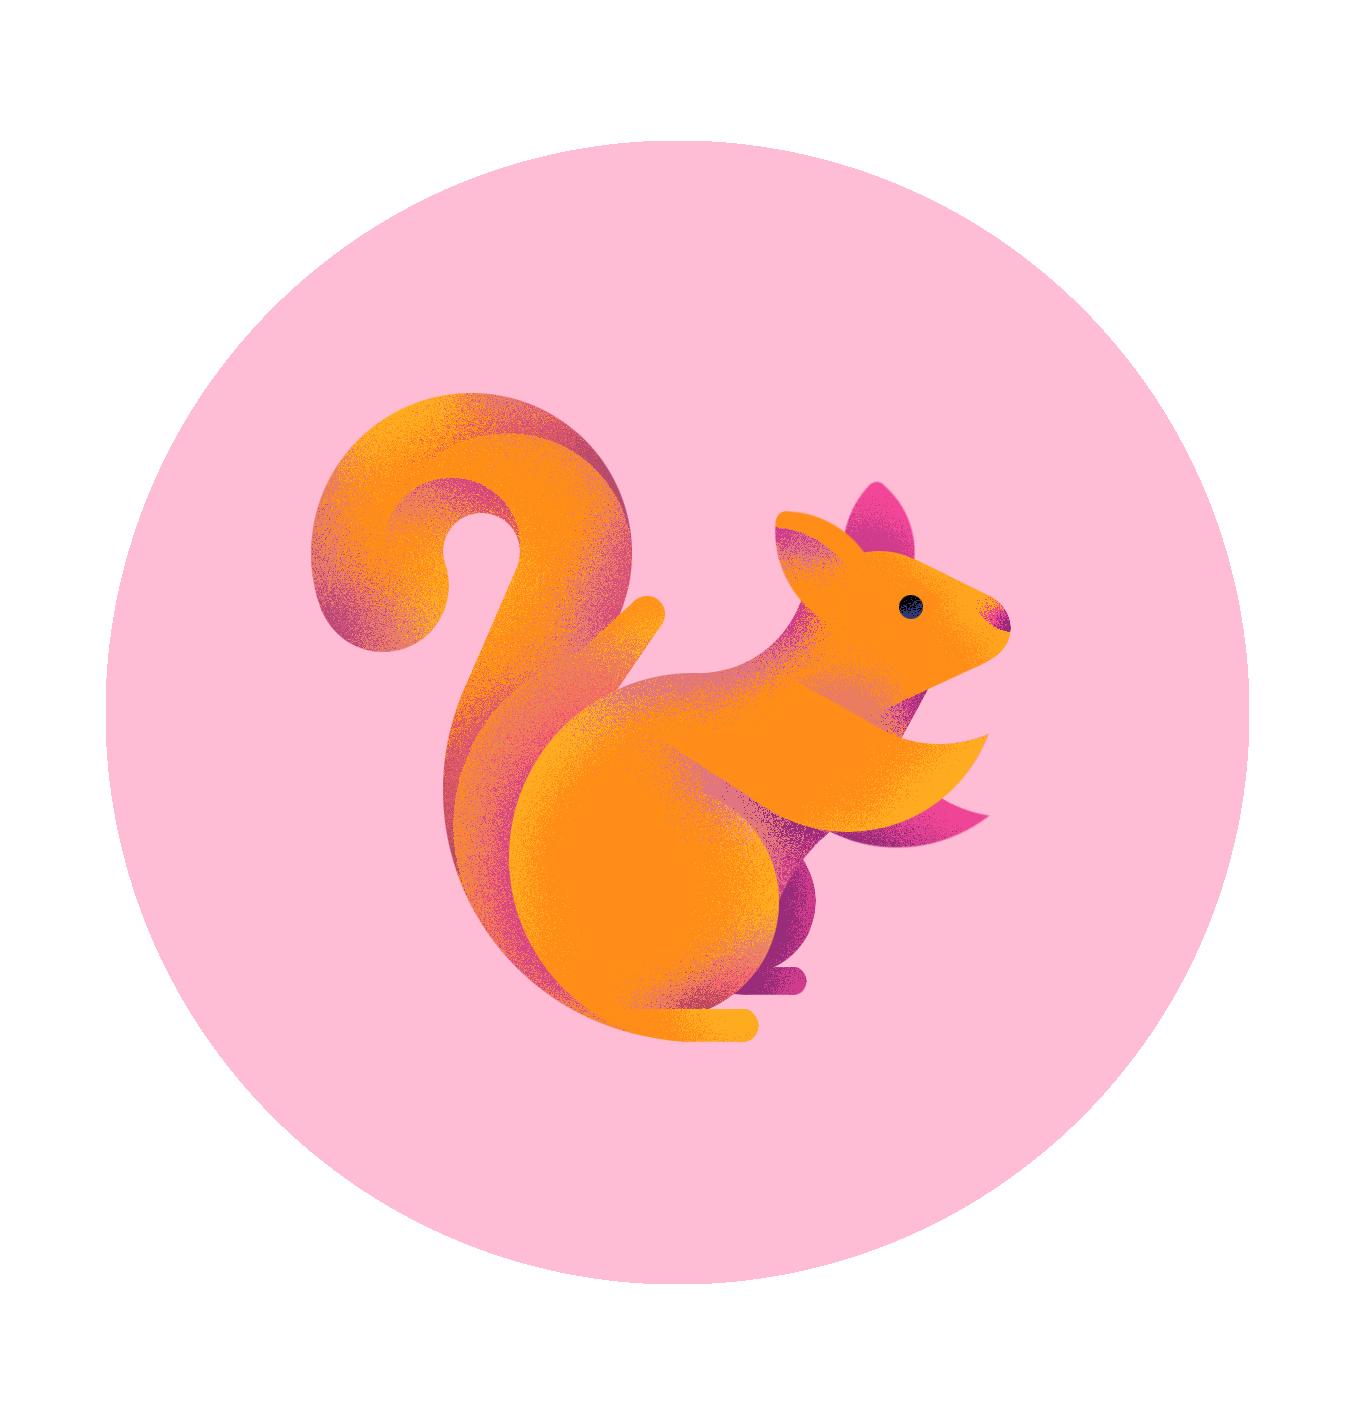 RGB_WSJ_Critters_Squirrel_.jpg